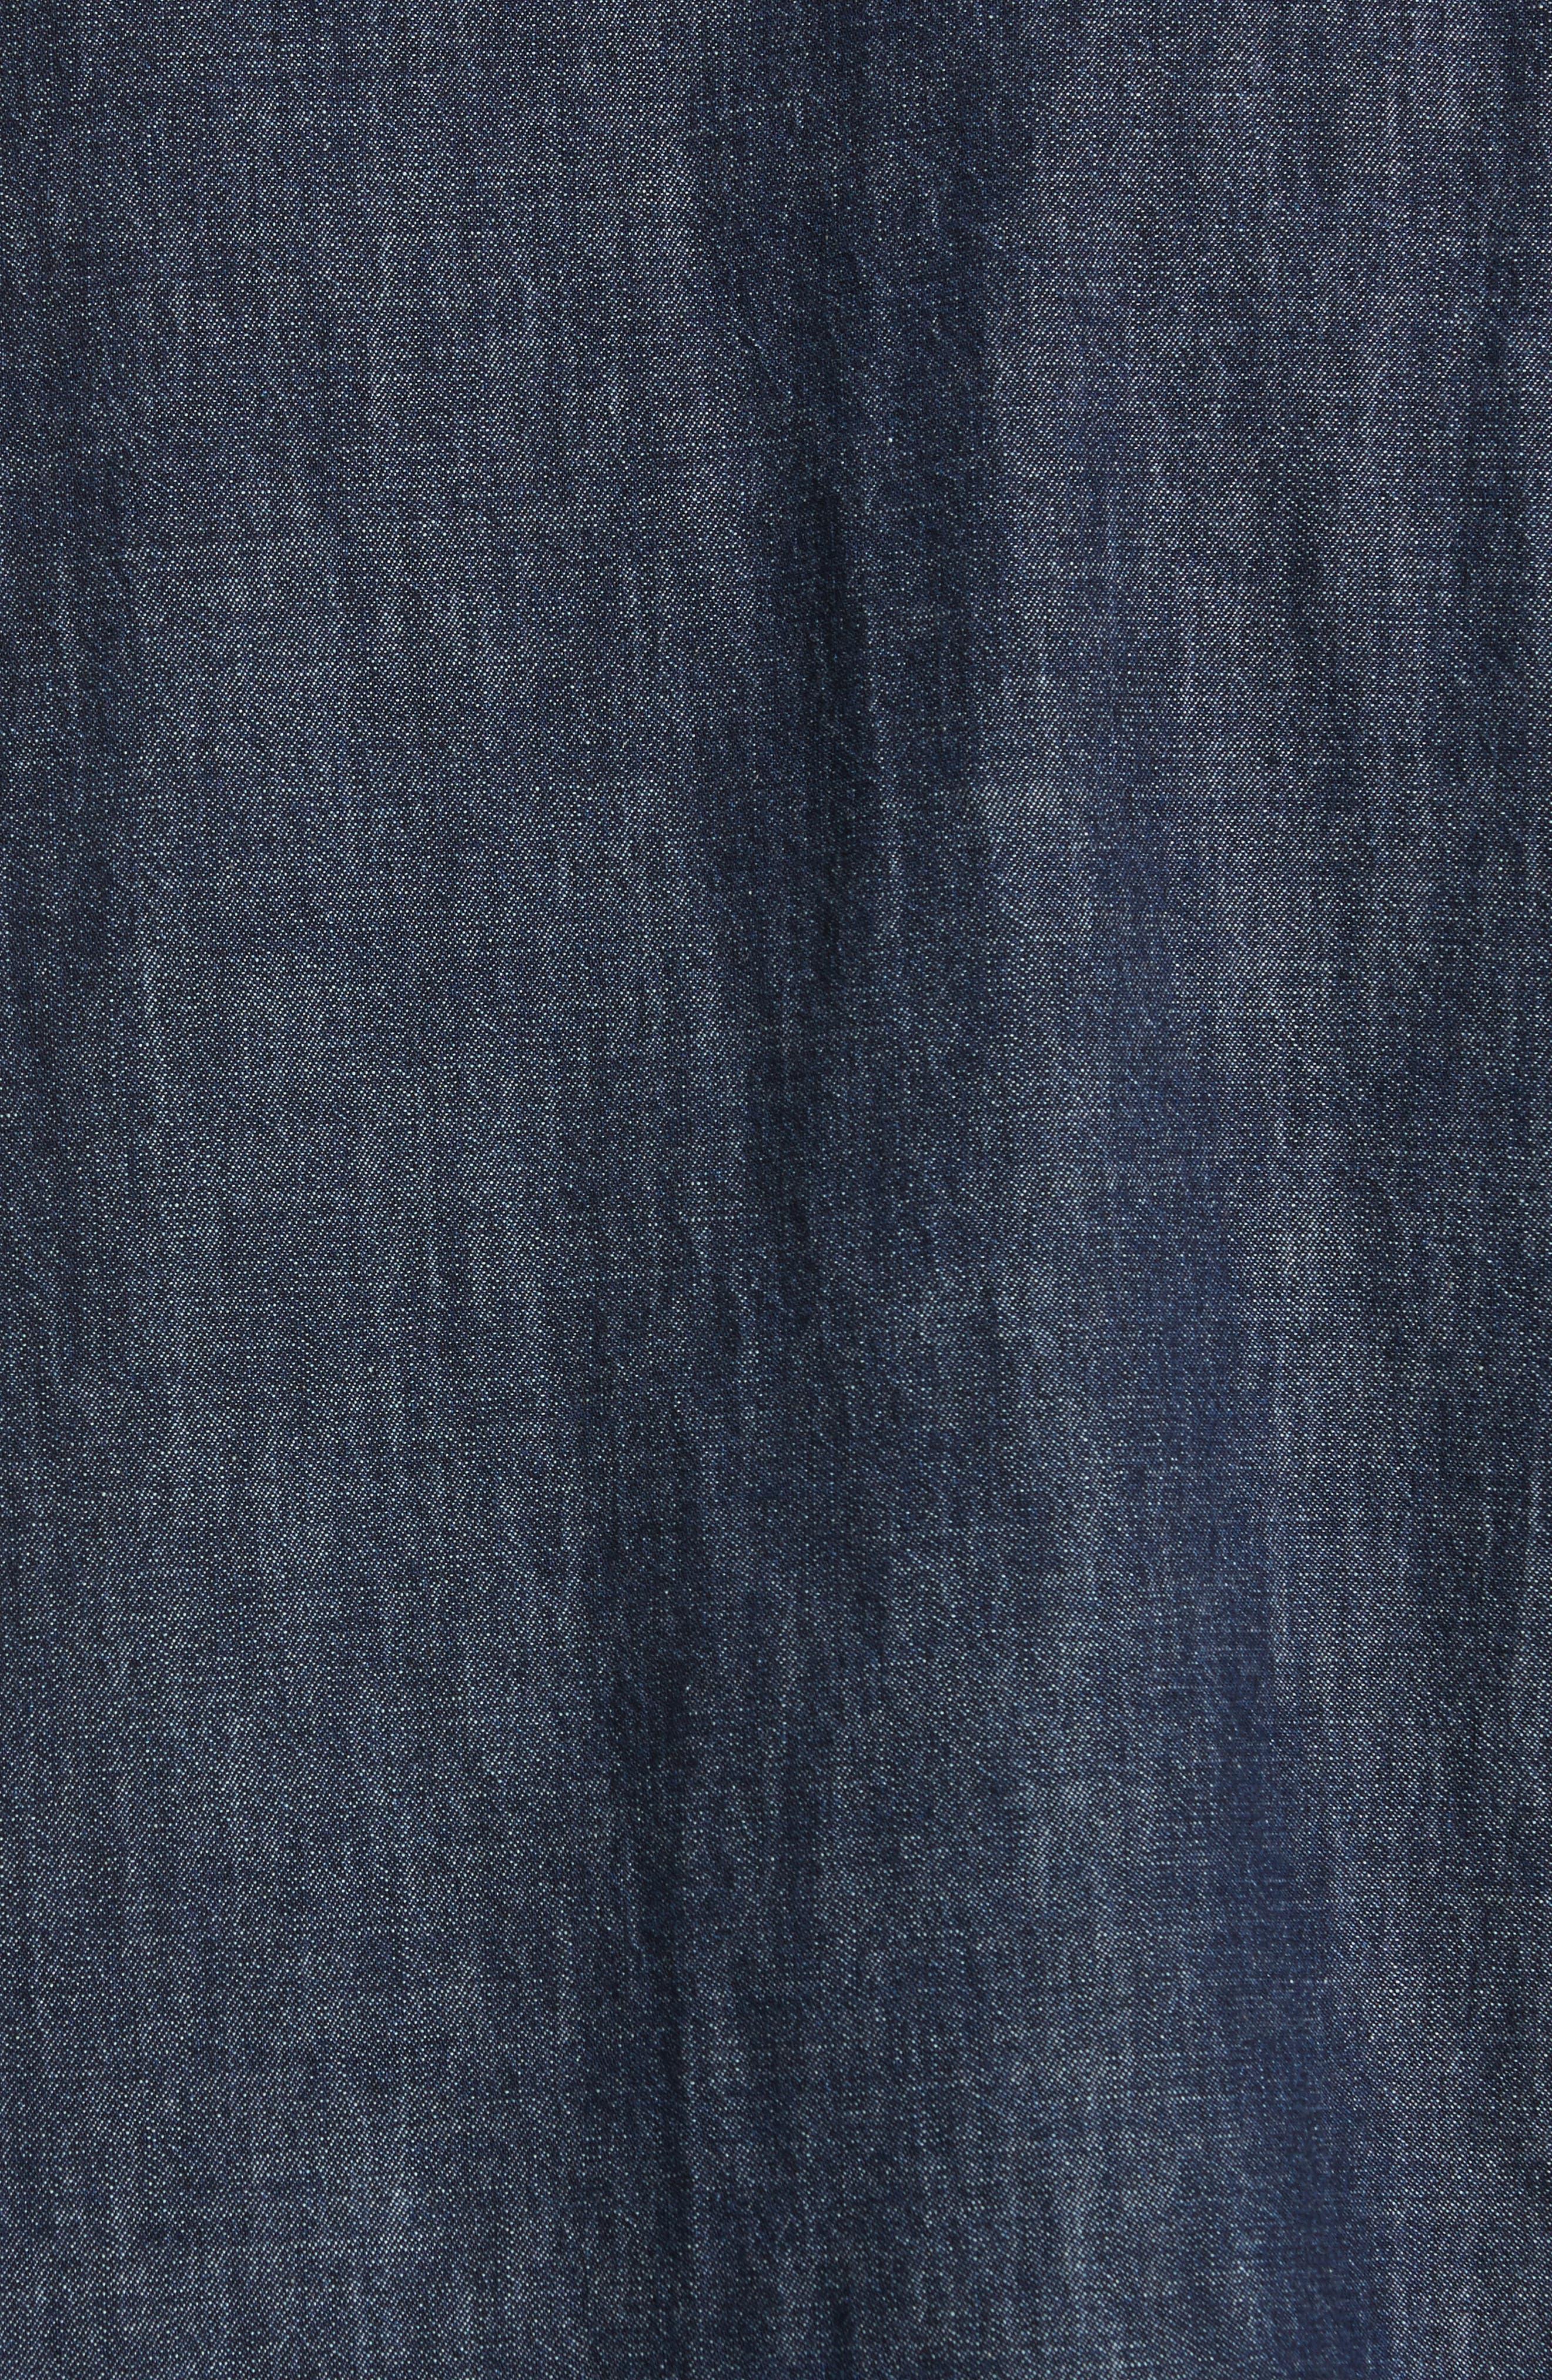 Beck Denim Shirt,                             Alternate thumbnail 2, color,                             470